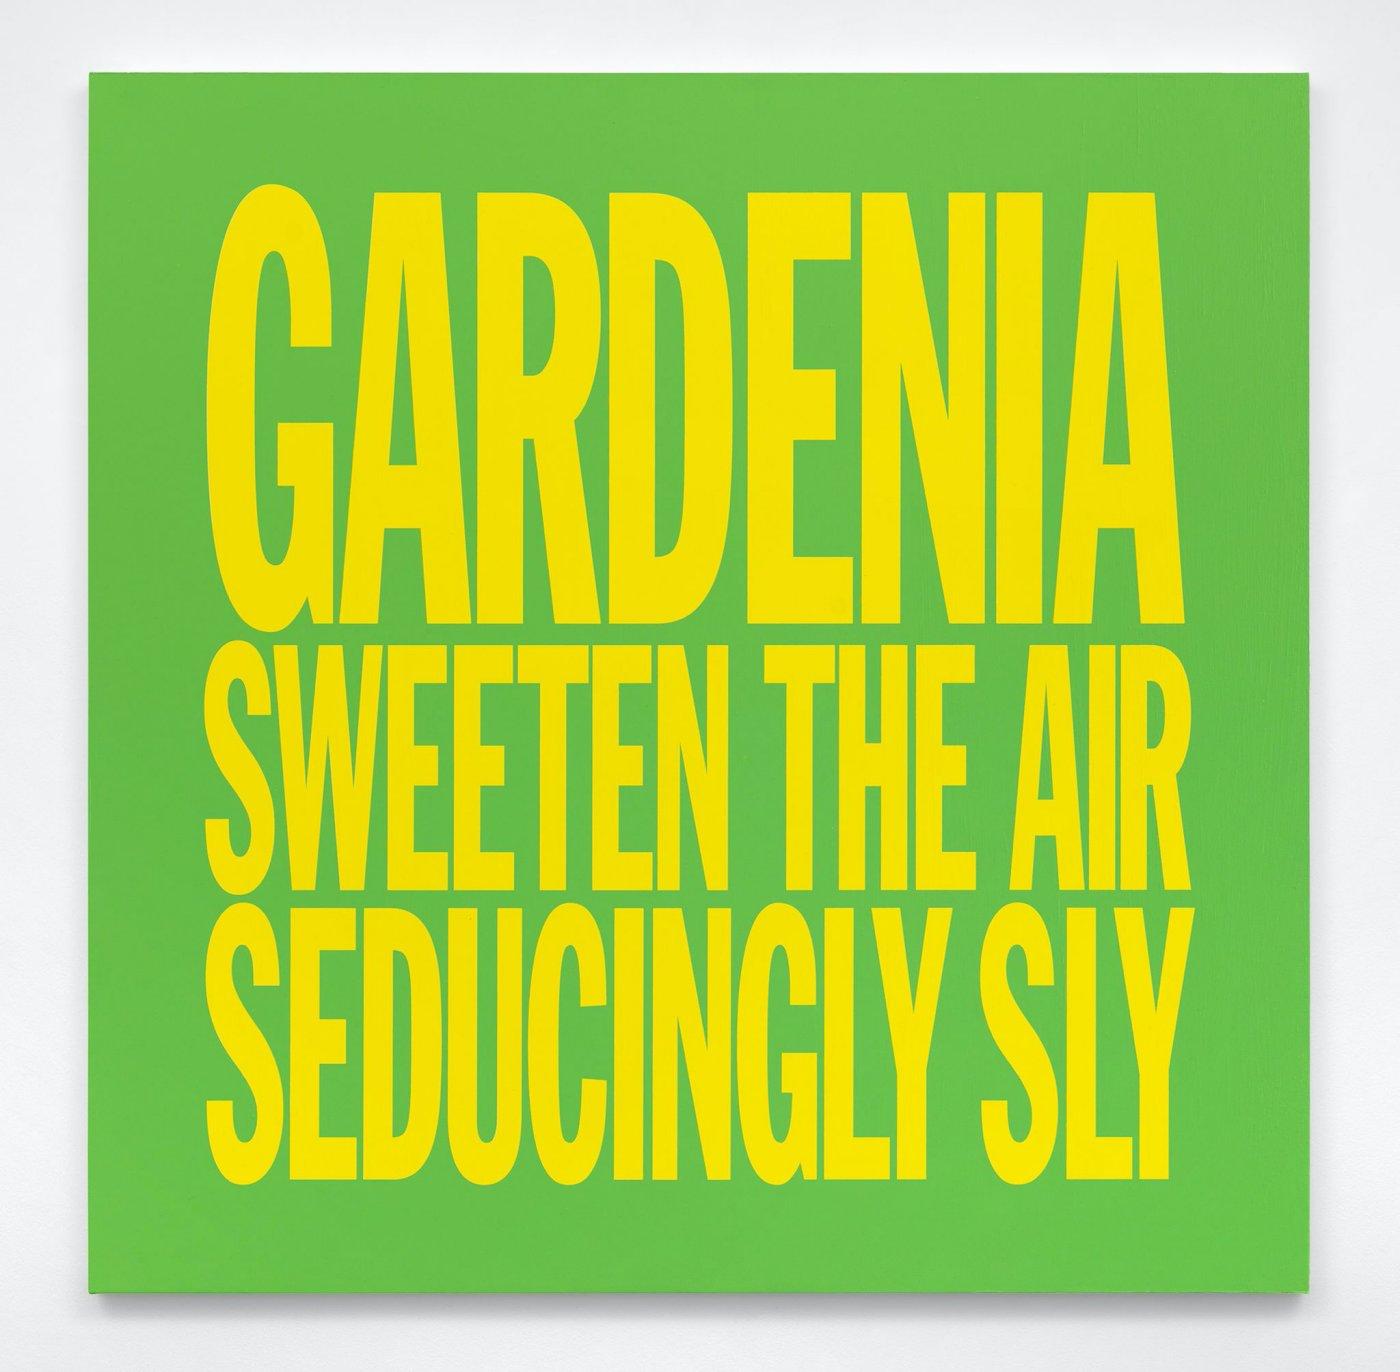 GARDENIA SWEETEN THE AIR  SEDUCINGLY SLY